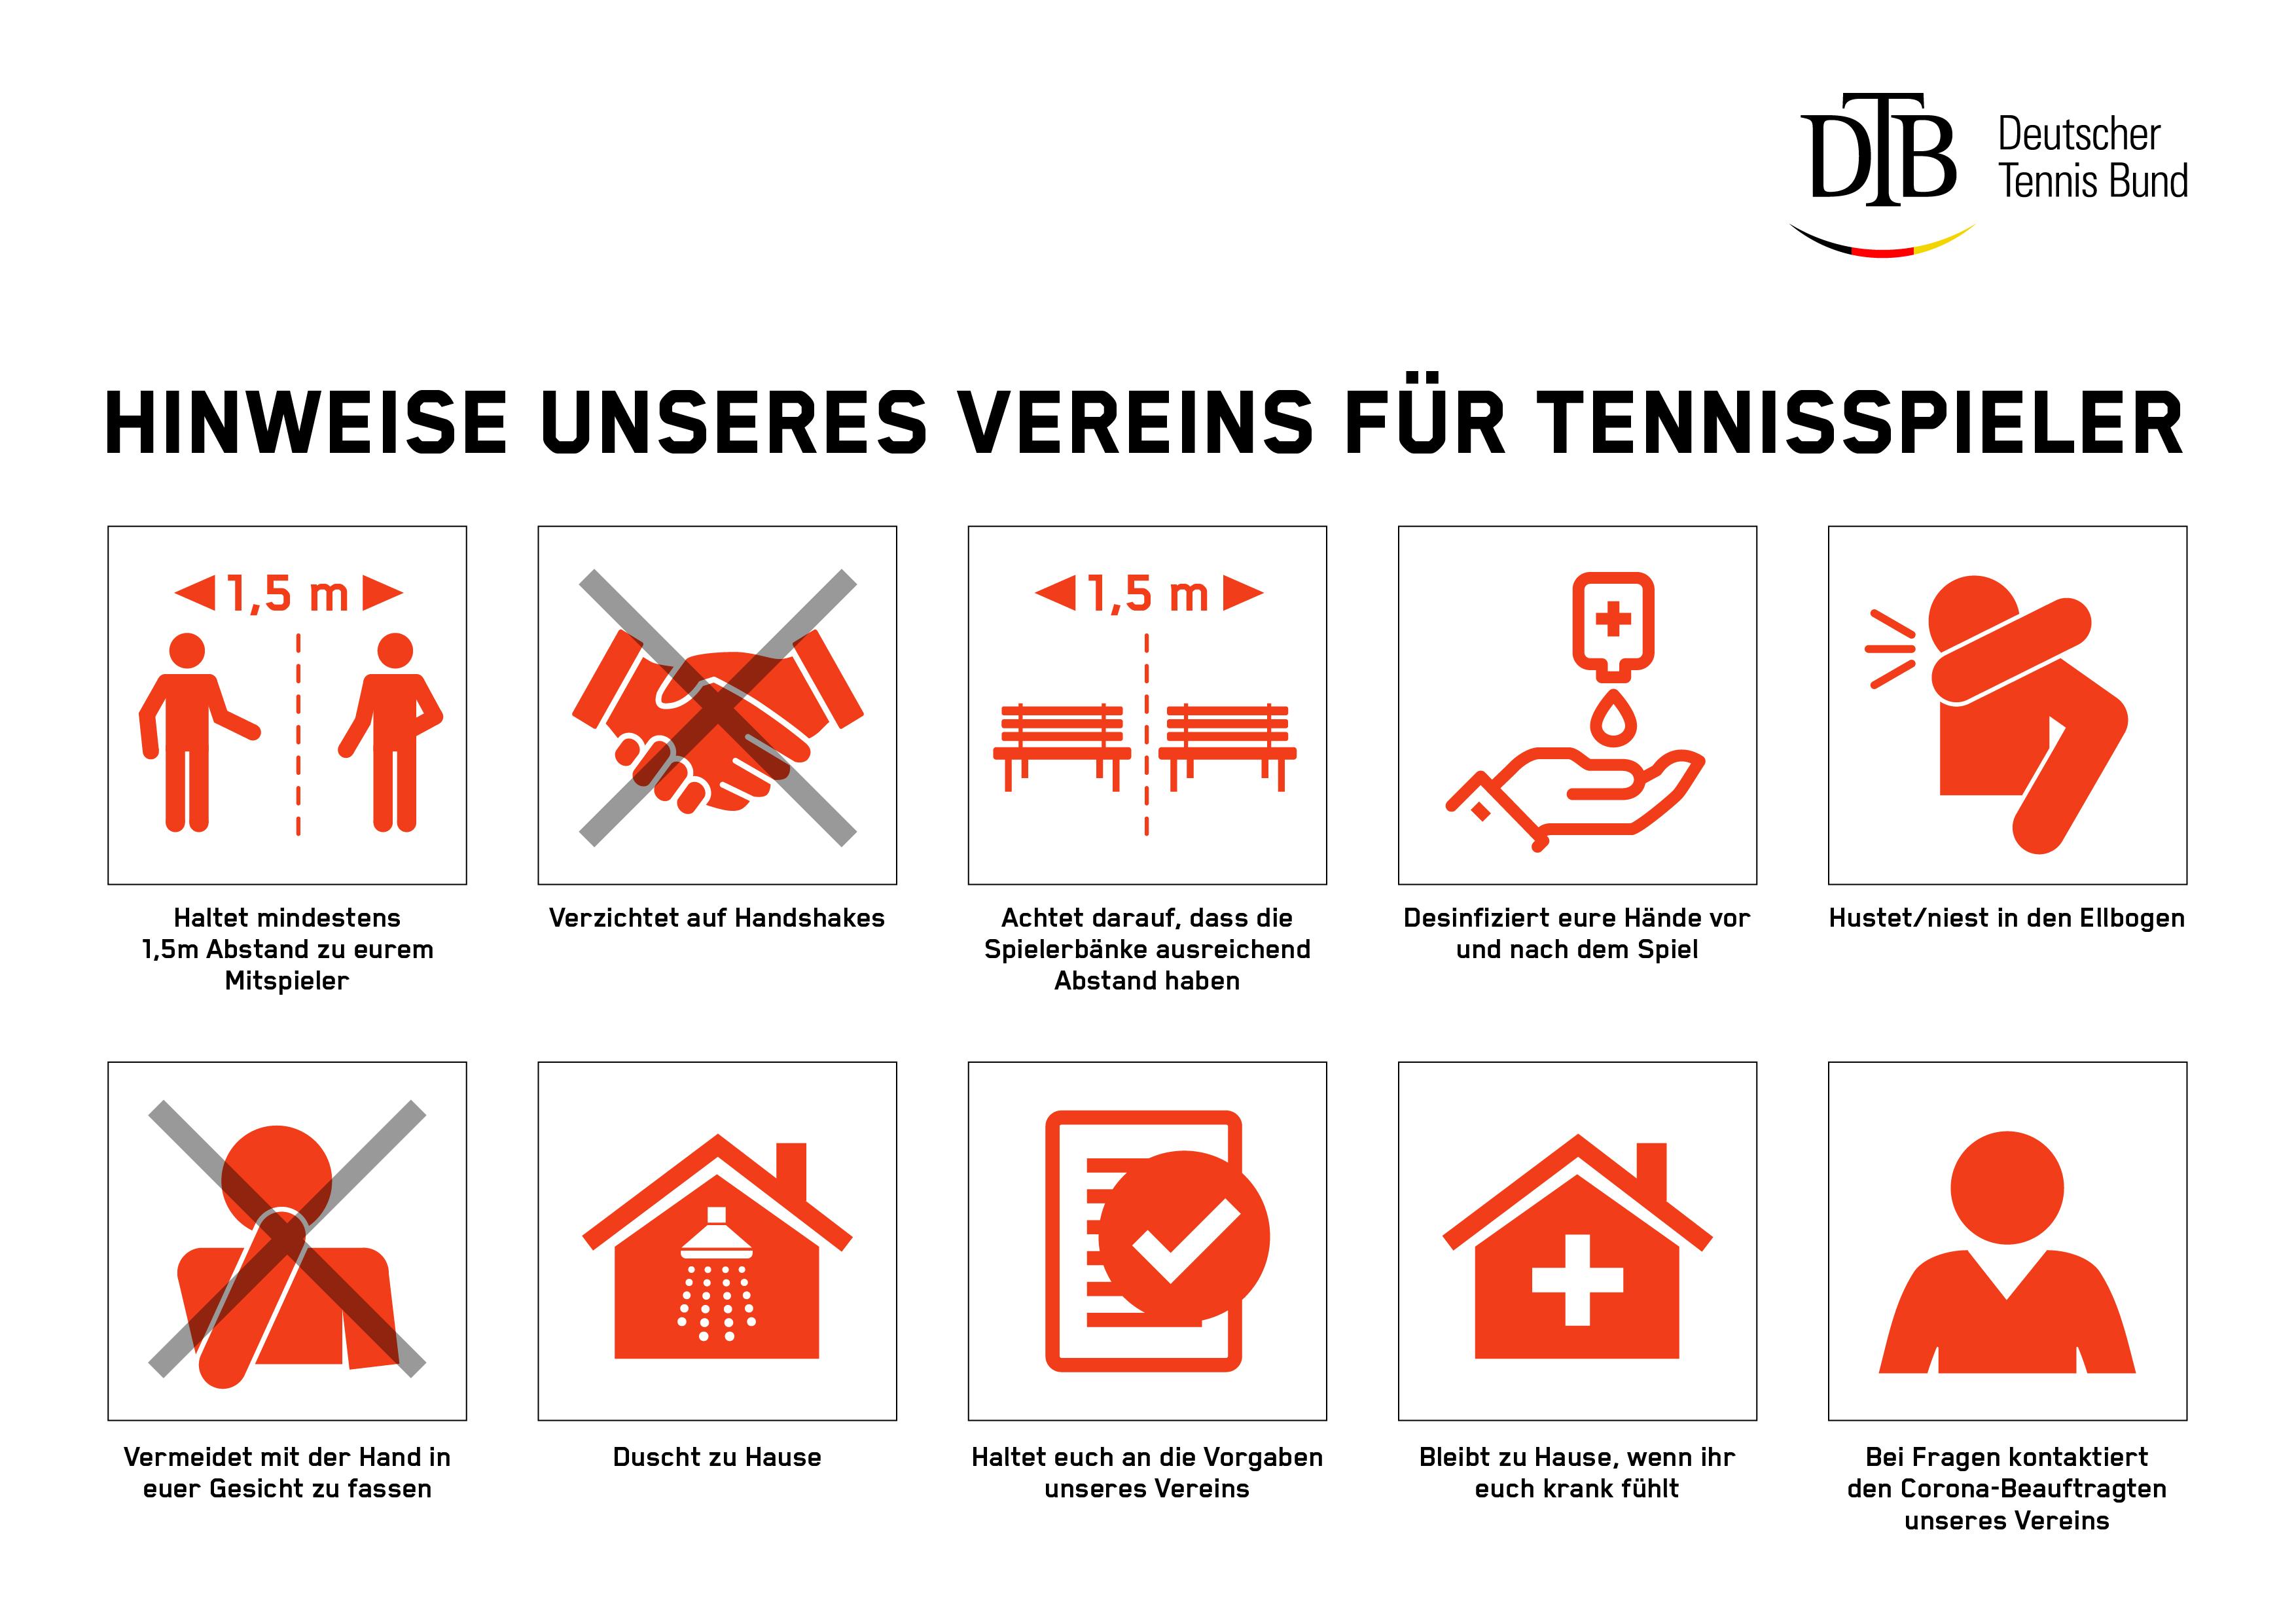 https://www.htv-tennis.de/assets/images/vereinsservice/2020/Hinweistafel_fuer_Vereine_DINA4.jpg